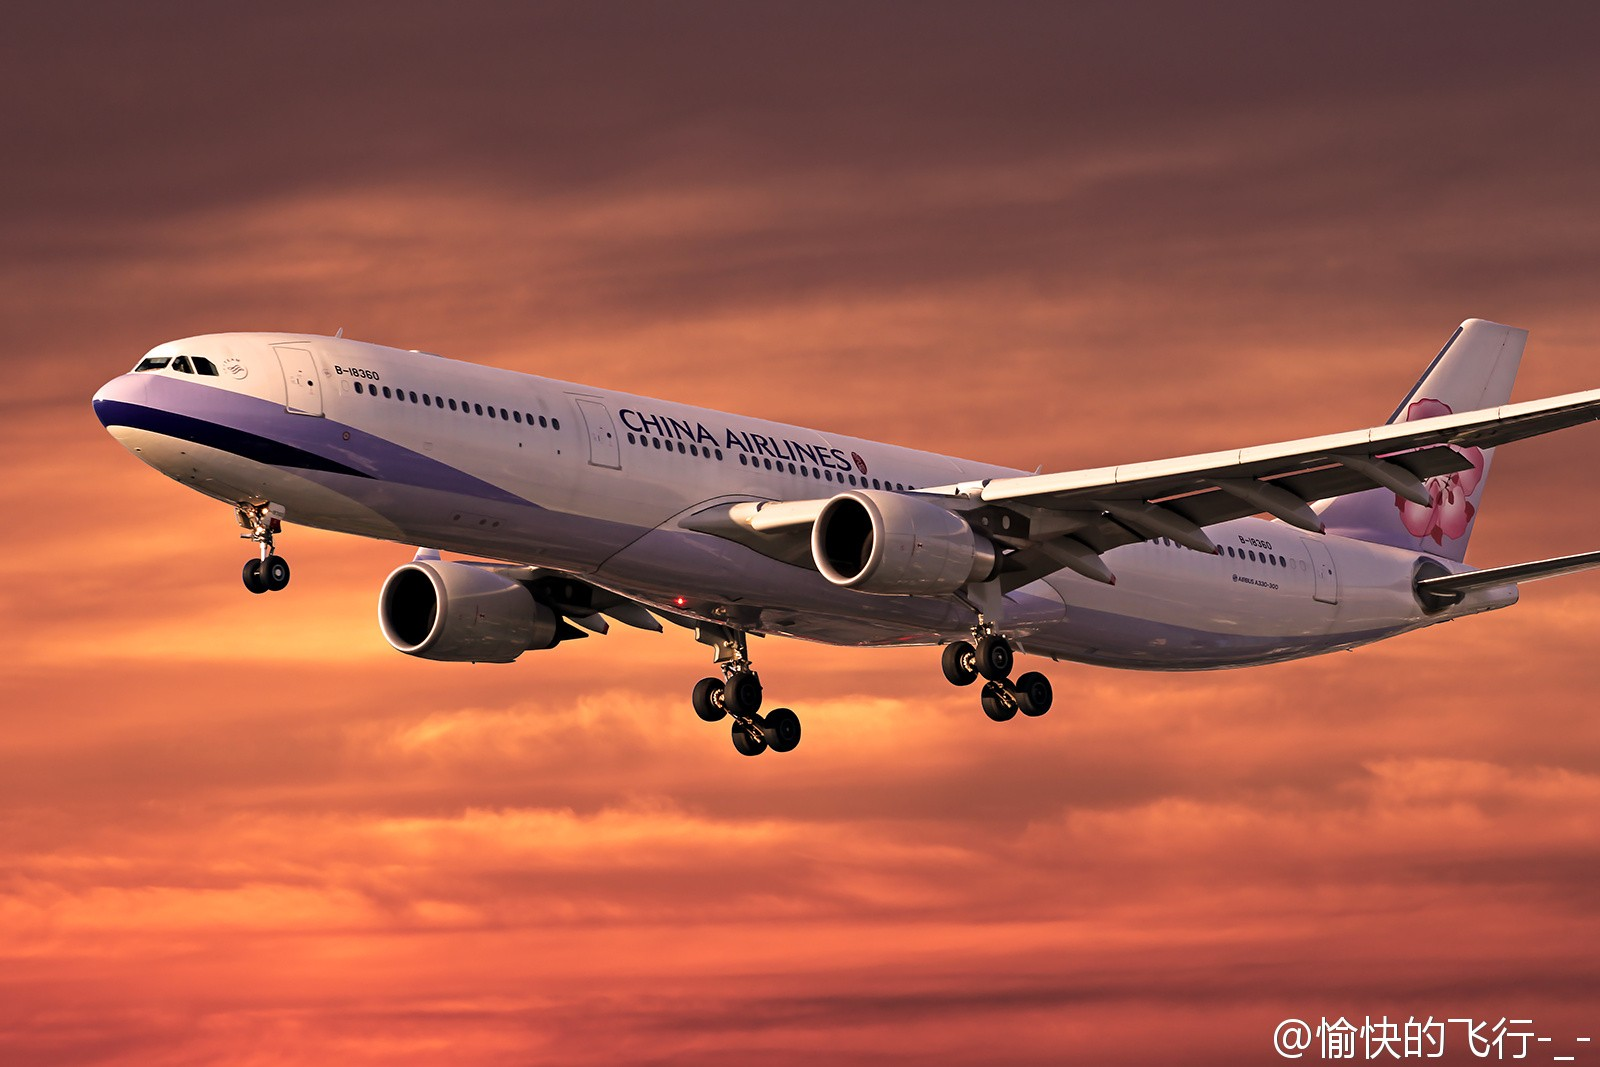 Re:[原创]。。。飞机美不美主要看背景。。。 AIRBUS A330-300 B-18360